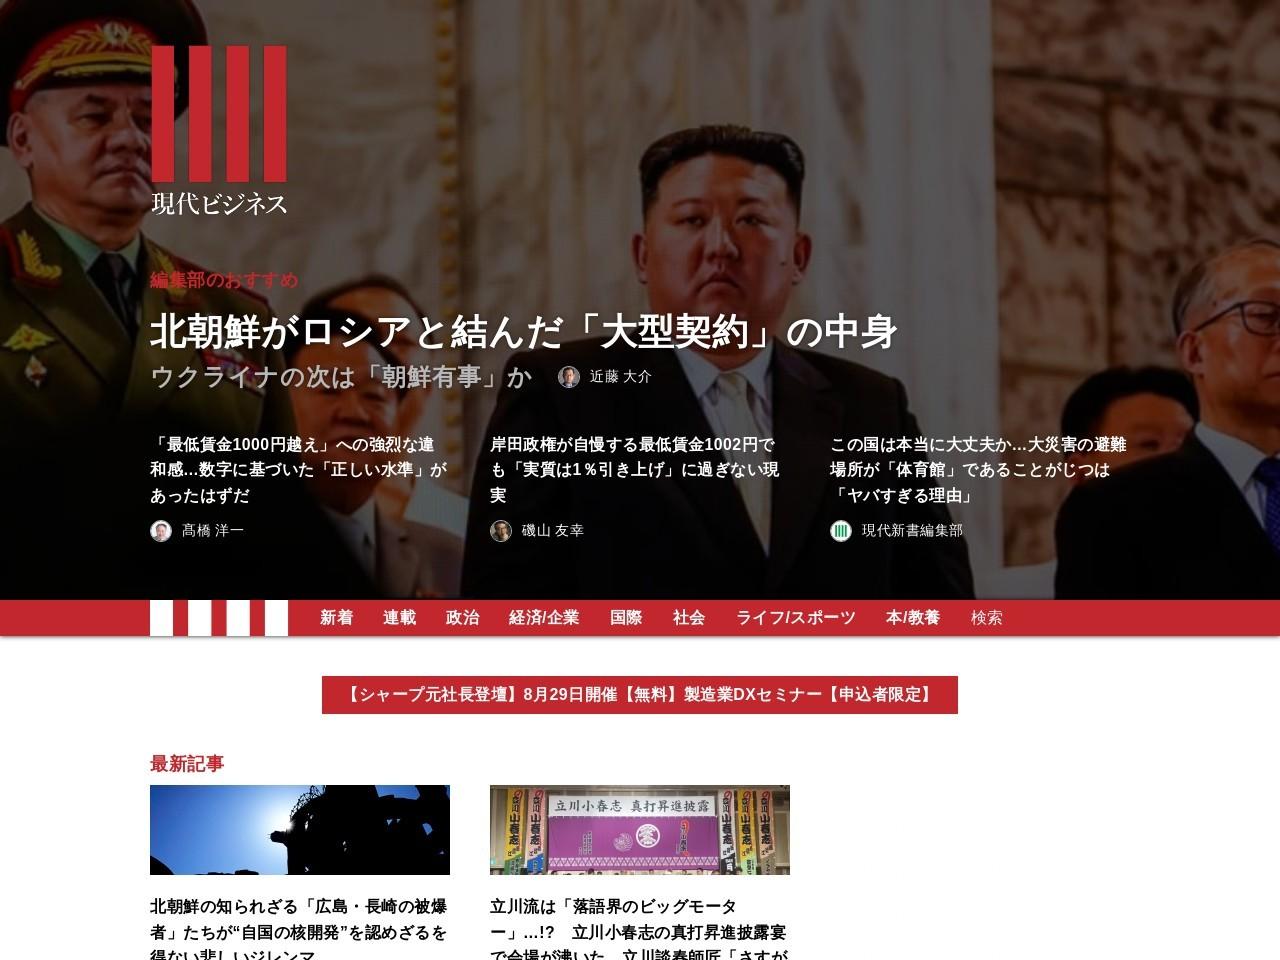 http://gendai.ismedia.jp/articles/-/26979